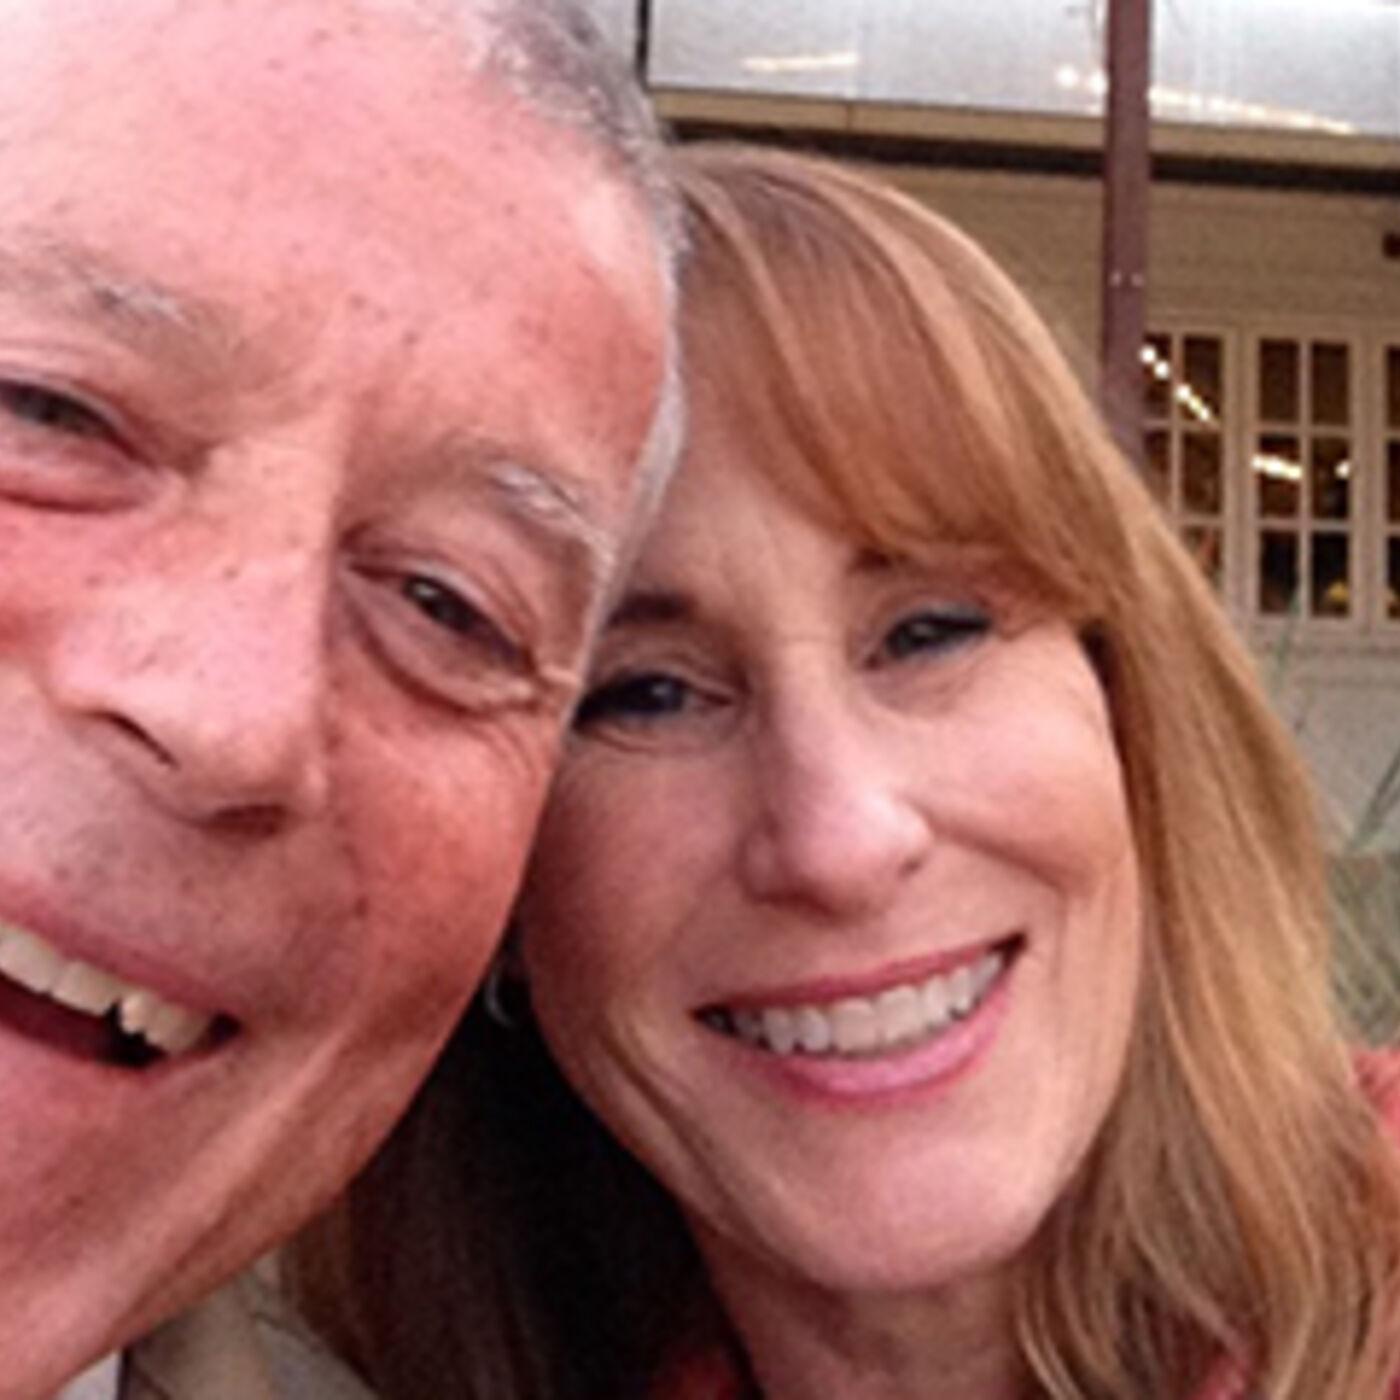 Episode 60 – Interview with Steve Bonenberger